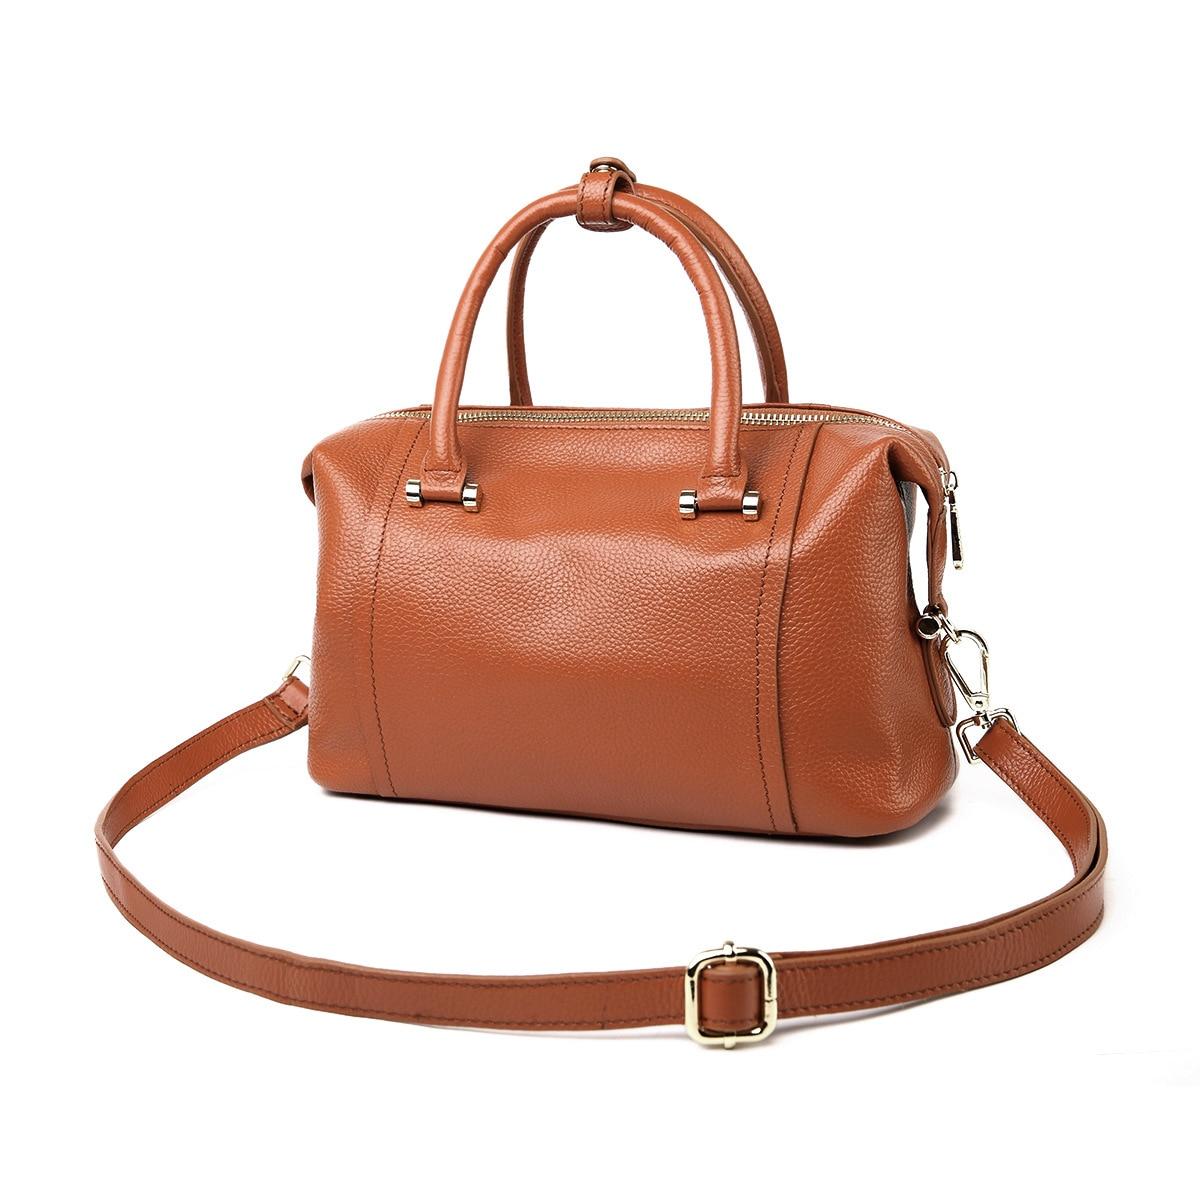 Online Get Cheap Shoulder Bag Handles -Aliexpress.com | Alibaba Group